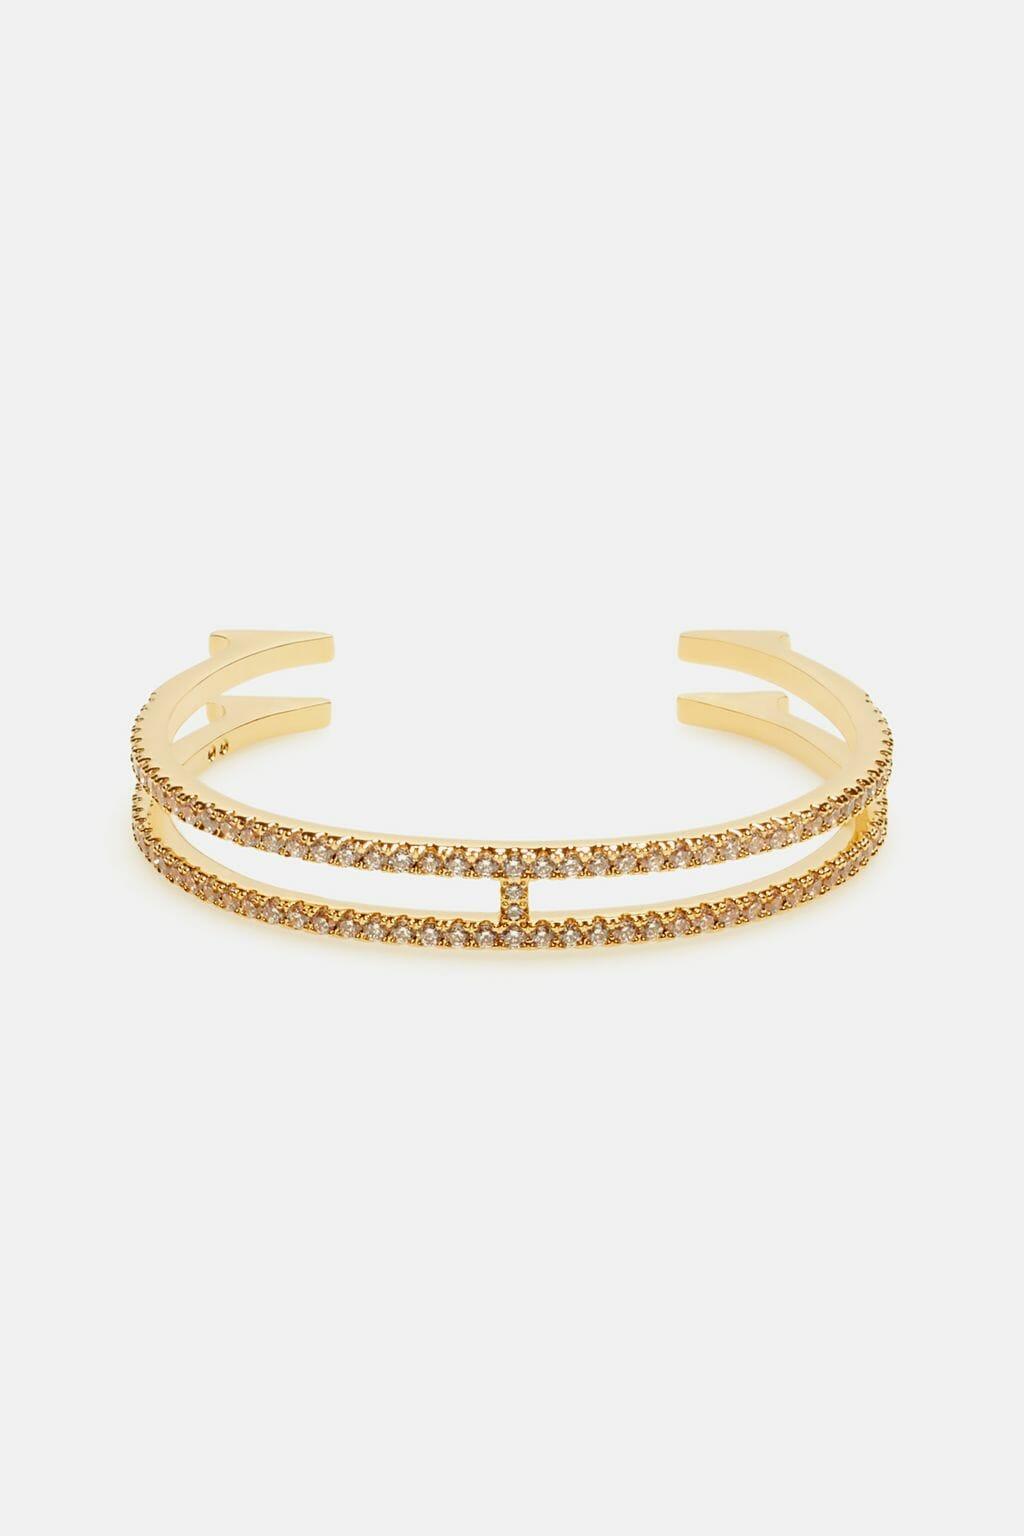 CH-Carolina-herrera-insignia-jewelry-look-20